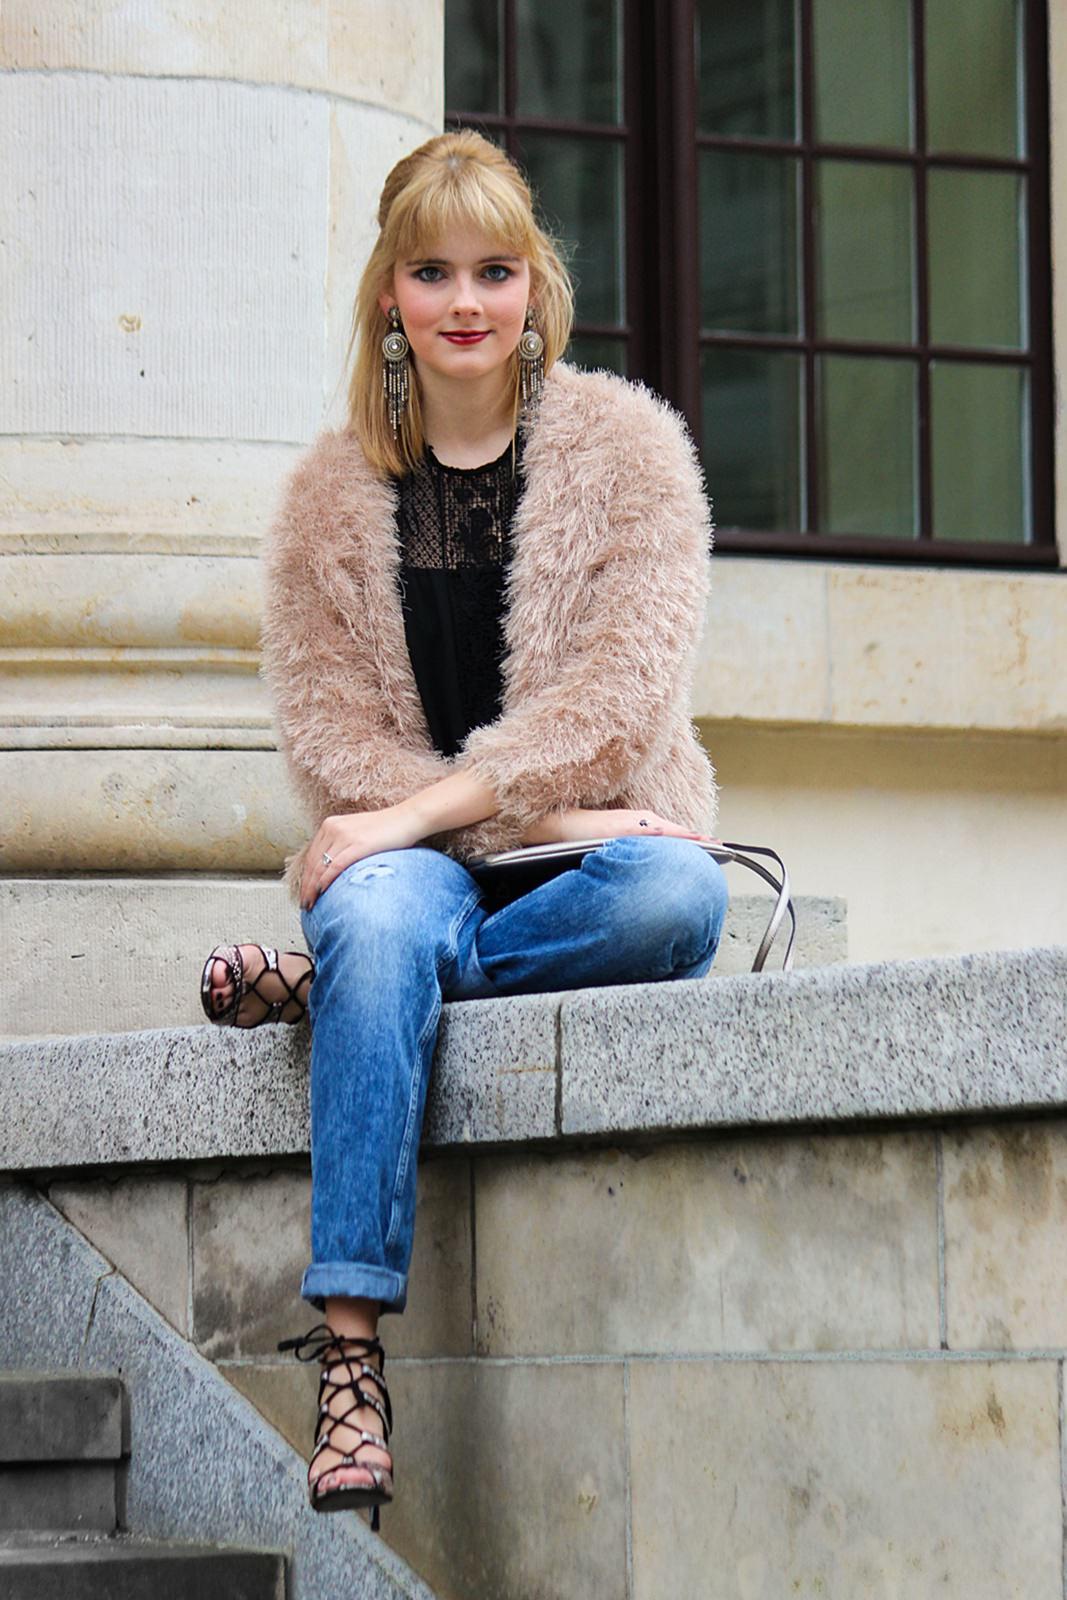 Des Belles Choses - Spot on snake print - Boyfriendjeans, fluffy jacket 7